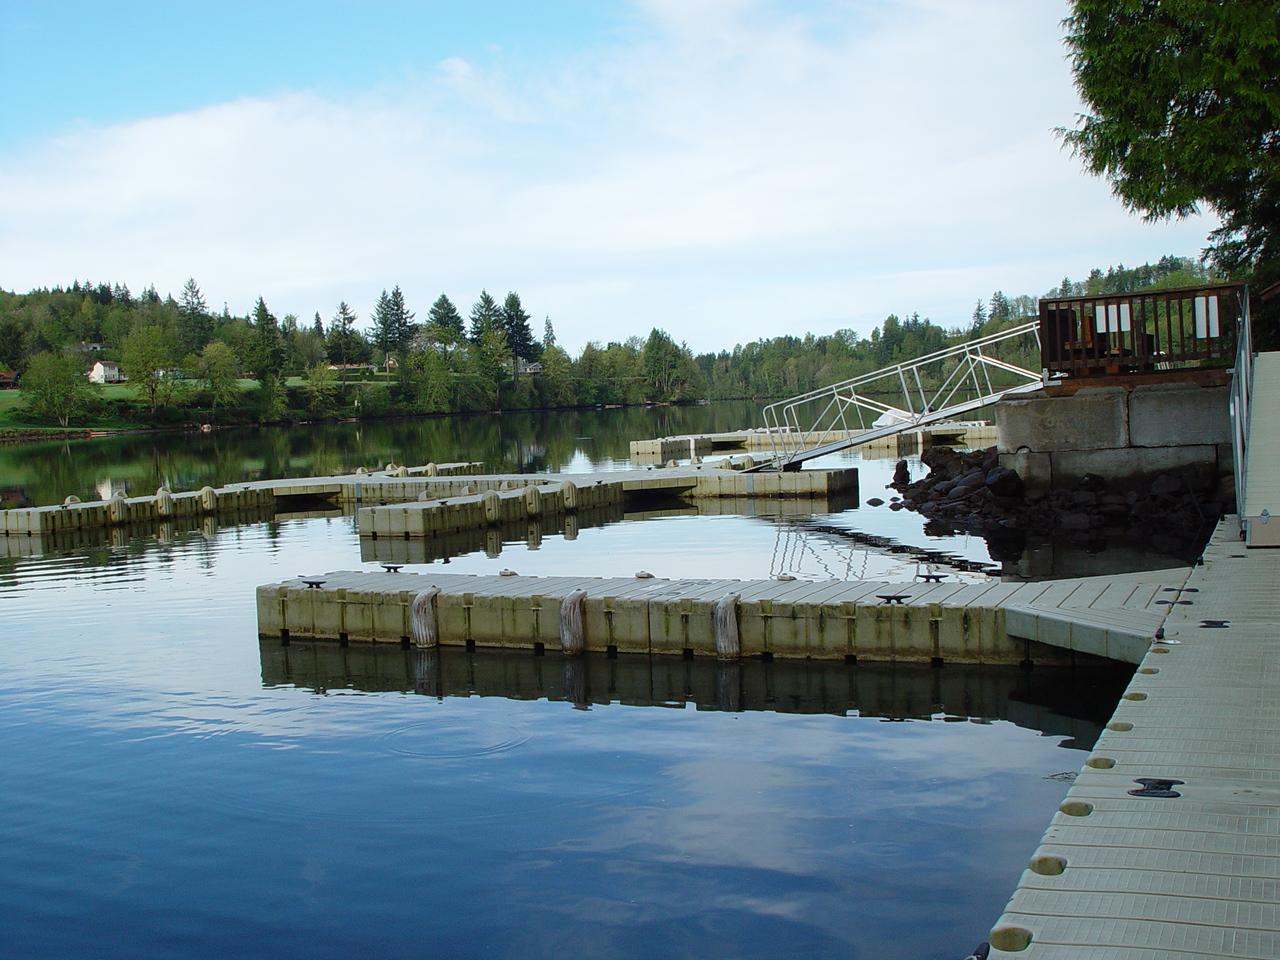 Wooden boat docks on glassy calm lake